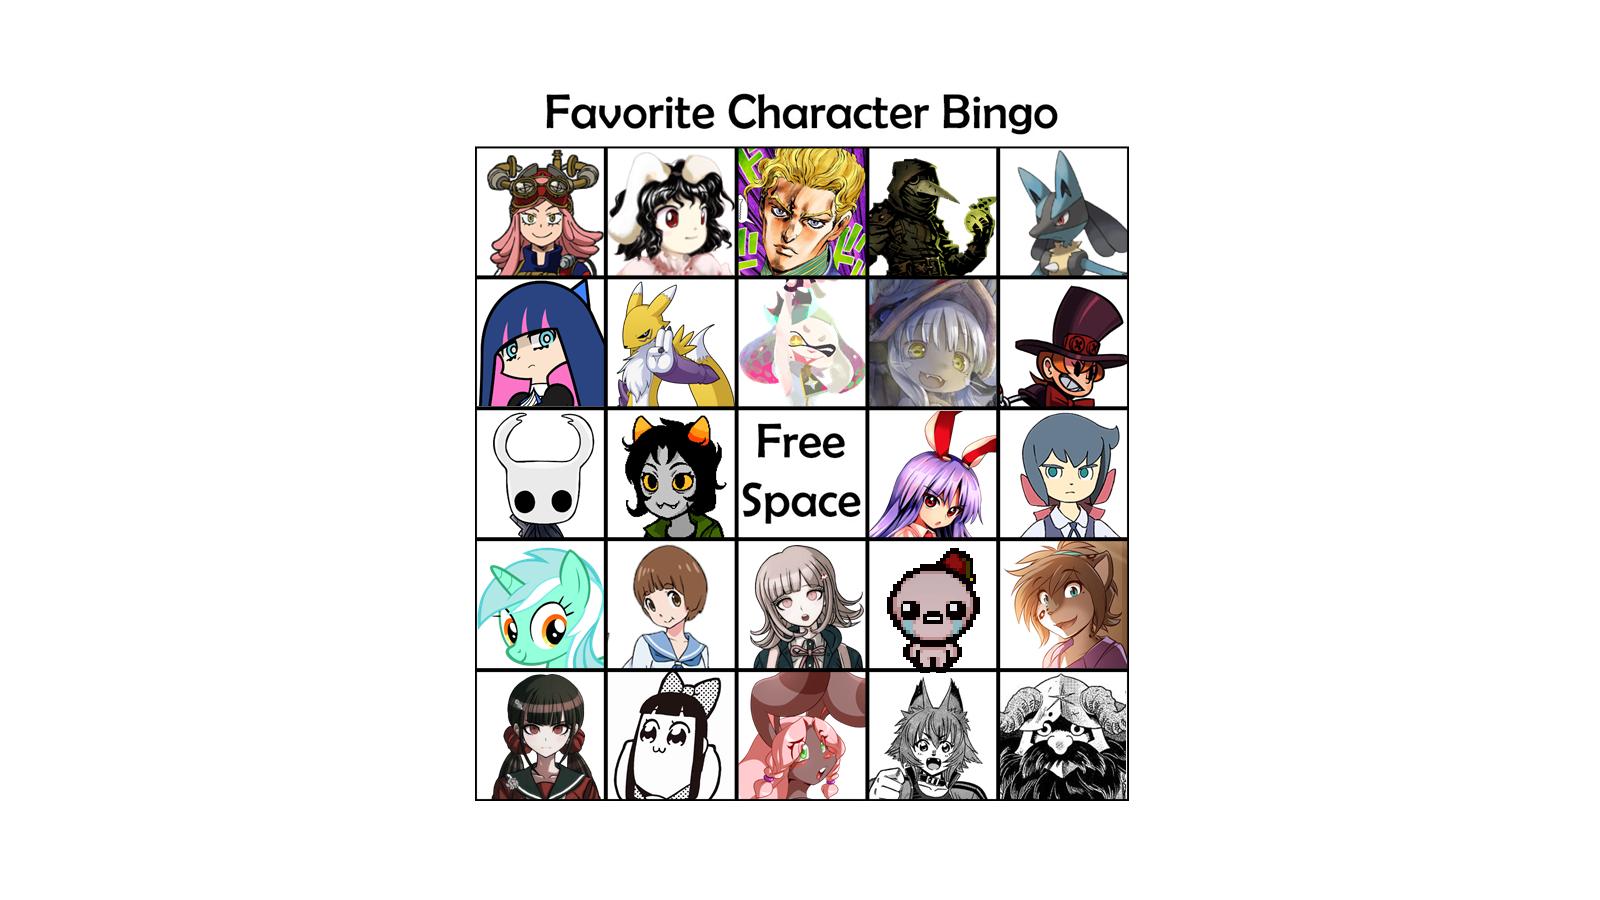 Favorite Character Bingo